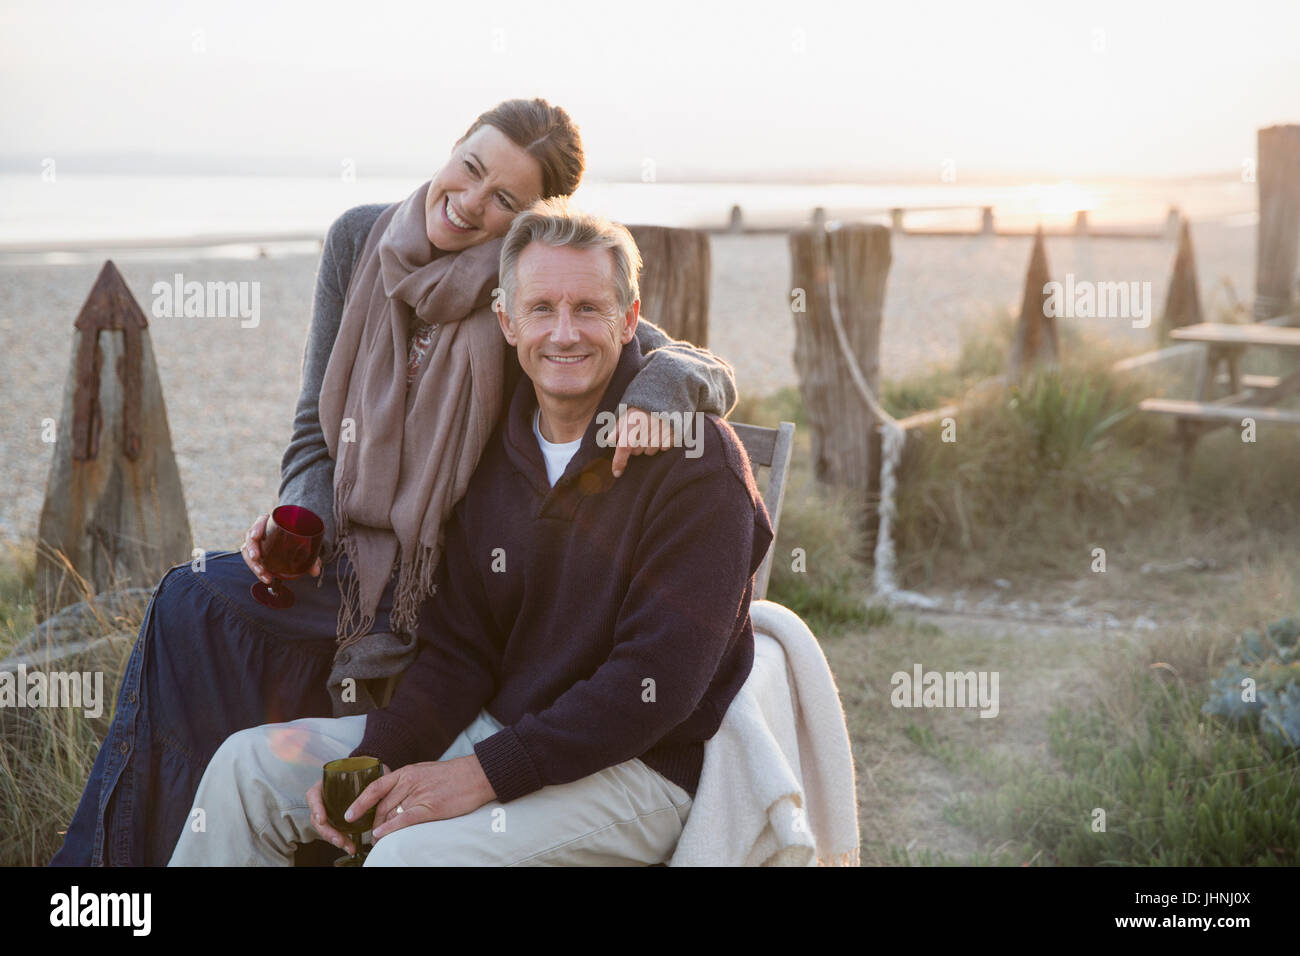 Portrait affectionate mature couple drinking wine on sunset beach - Stock Image